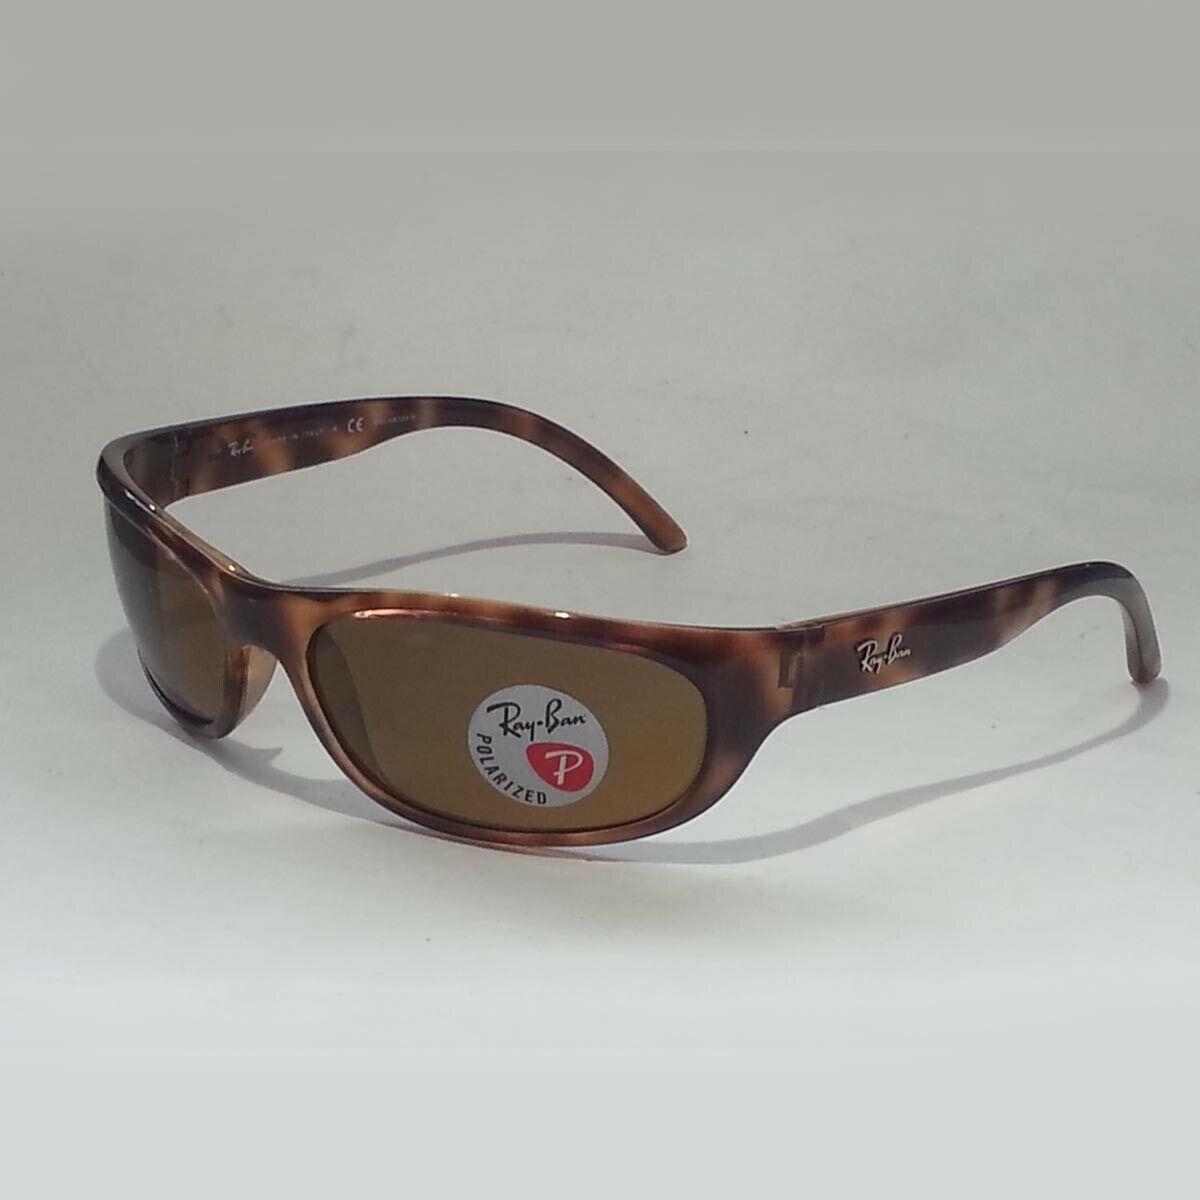 Oakley Sunglasses 80 OFF!>> men sunglasses sale RayBan